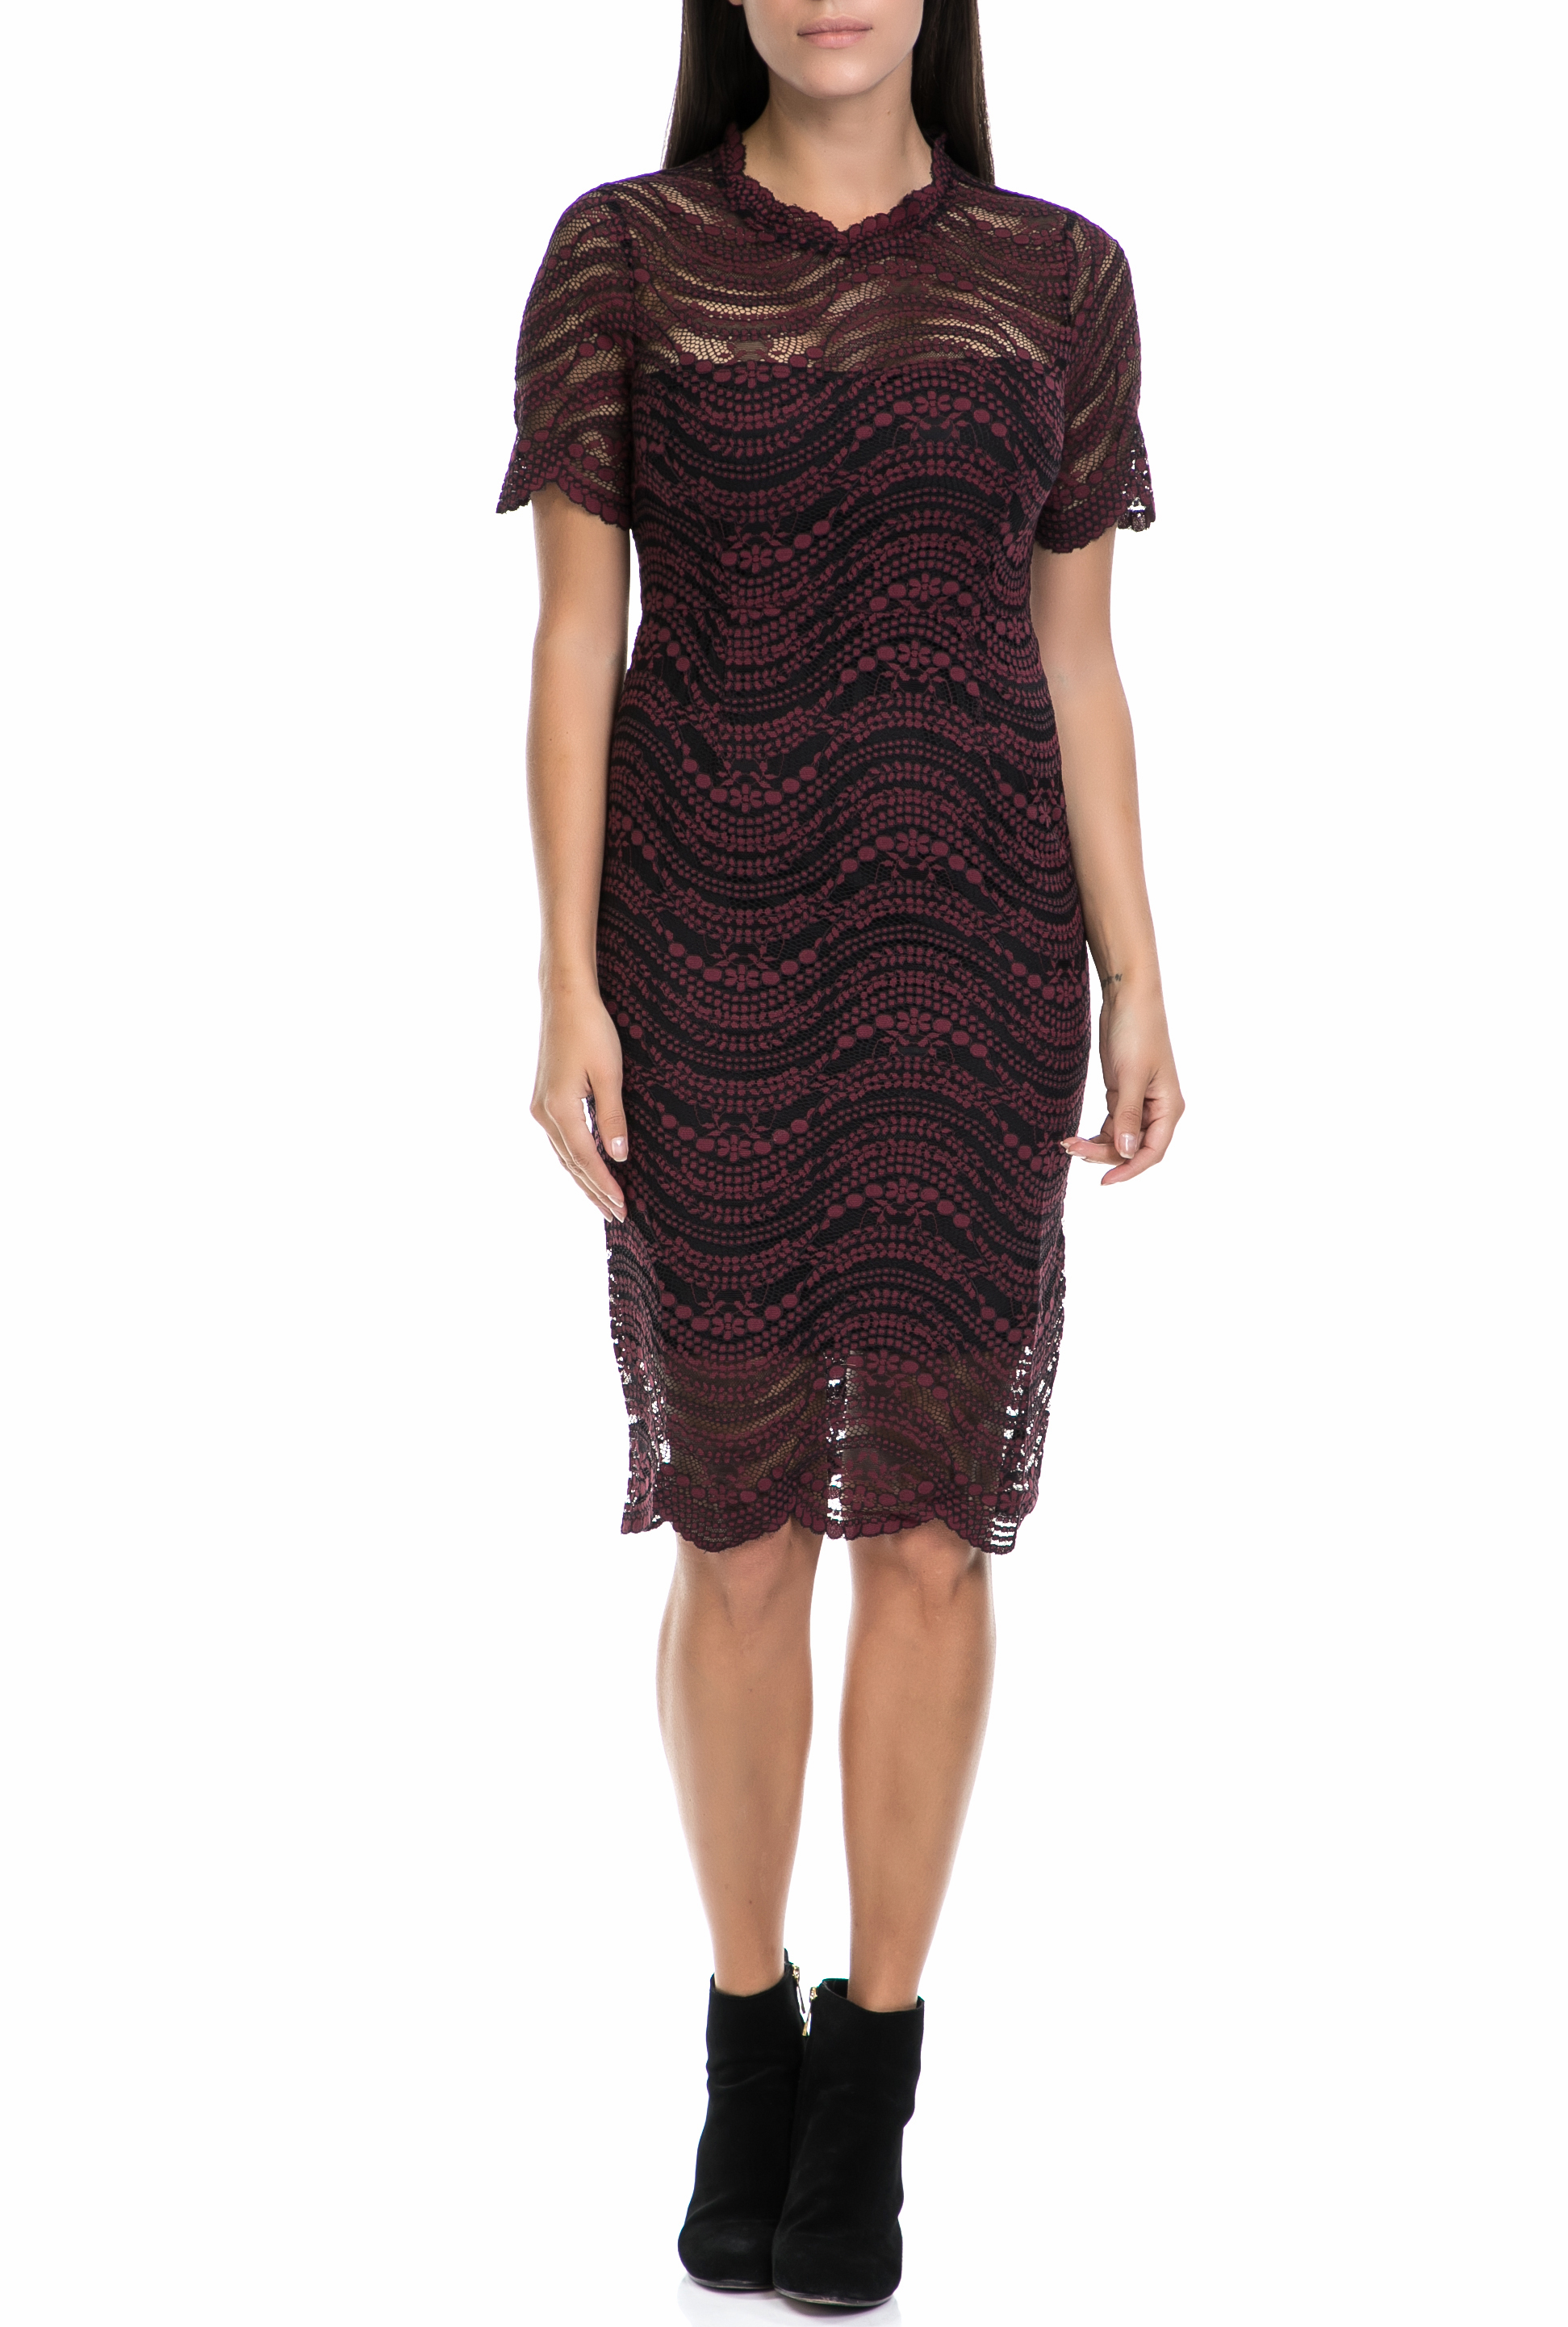 MOLLY BRACKEN - Γυναικείο φόρεμα MOLLY BRACKEN μαύρο-μπορντό γυναικεία ρούχα φορέματα μέχρι το γόνατο